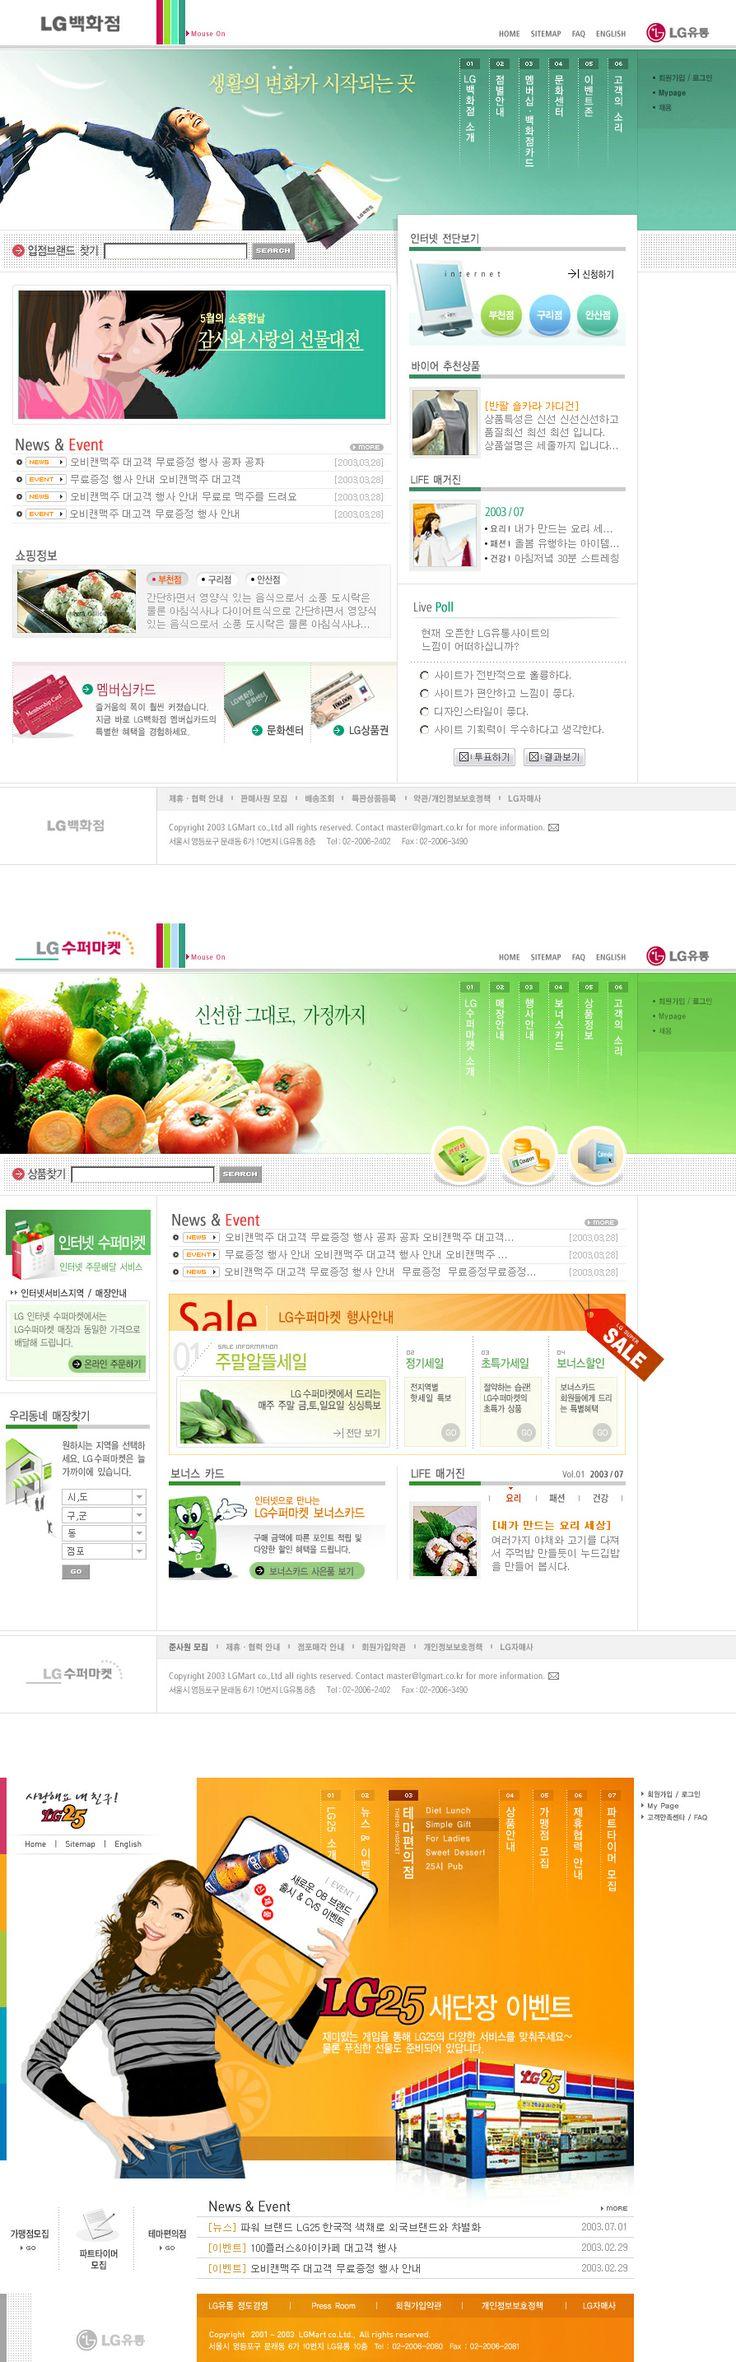 LG유통 통합 웹사이트